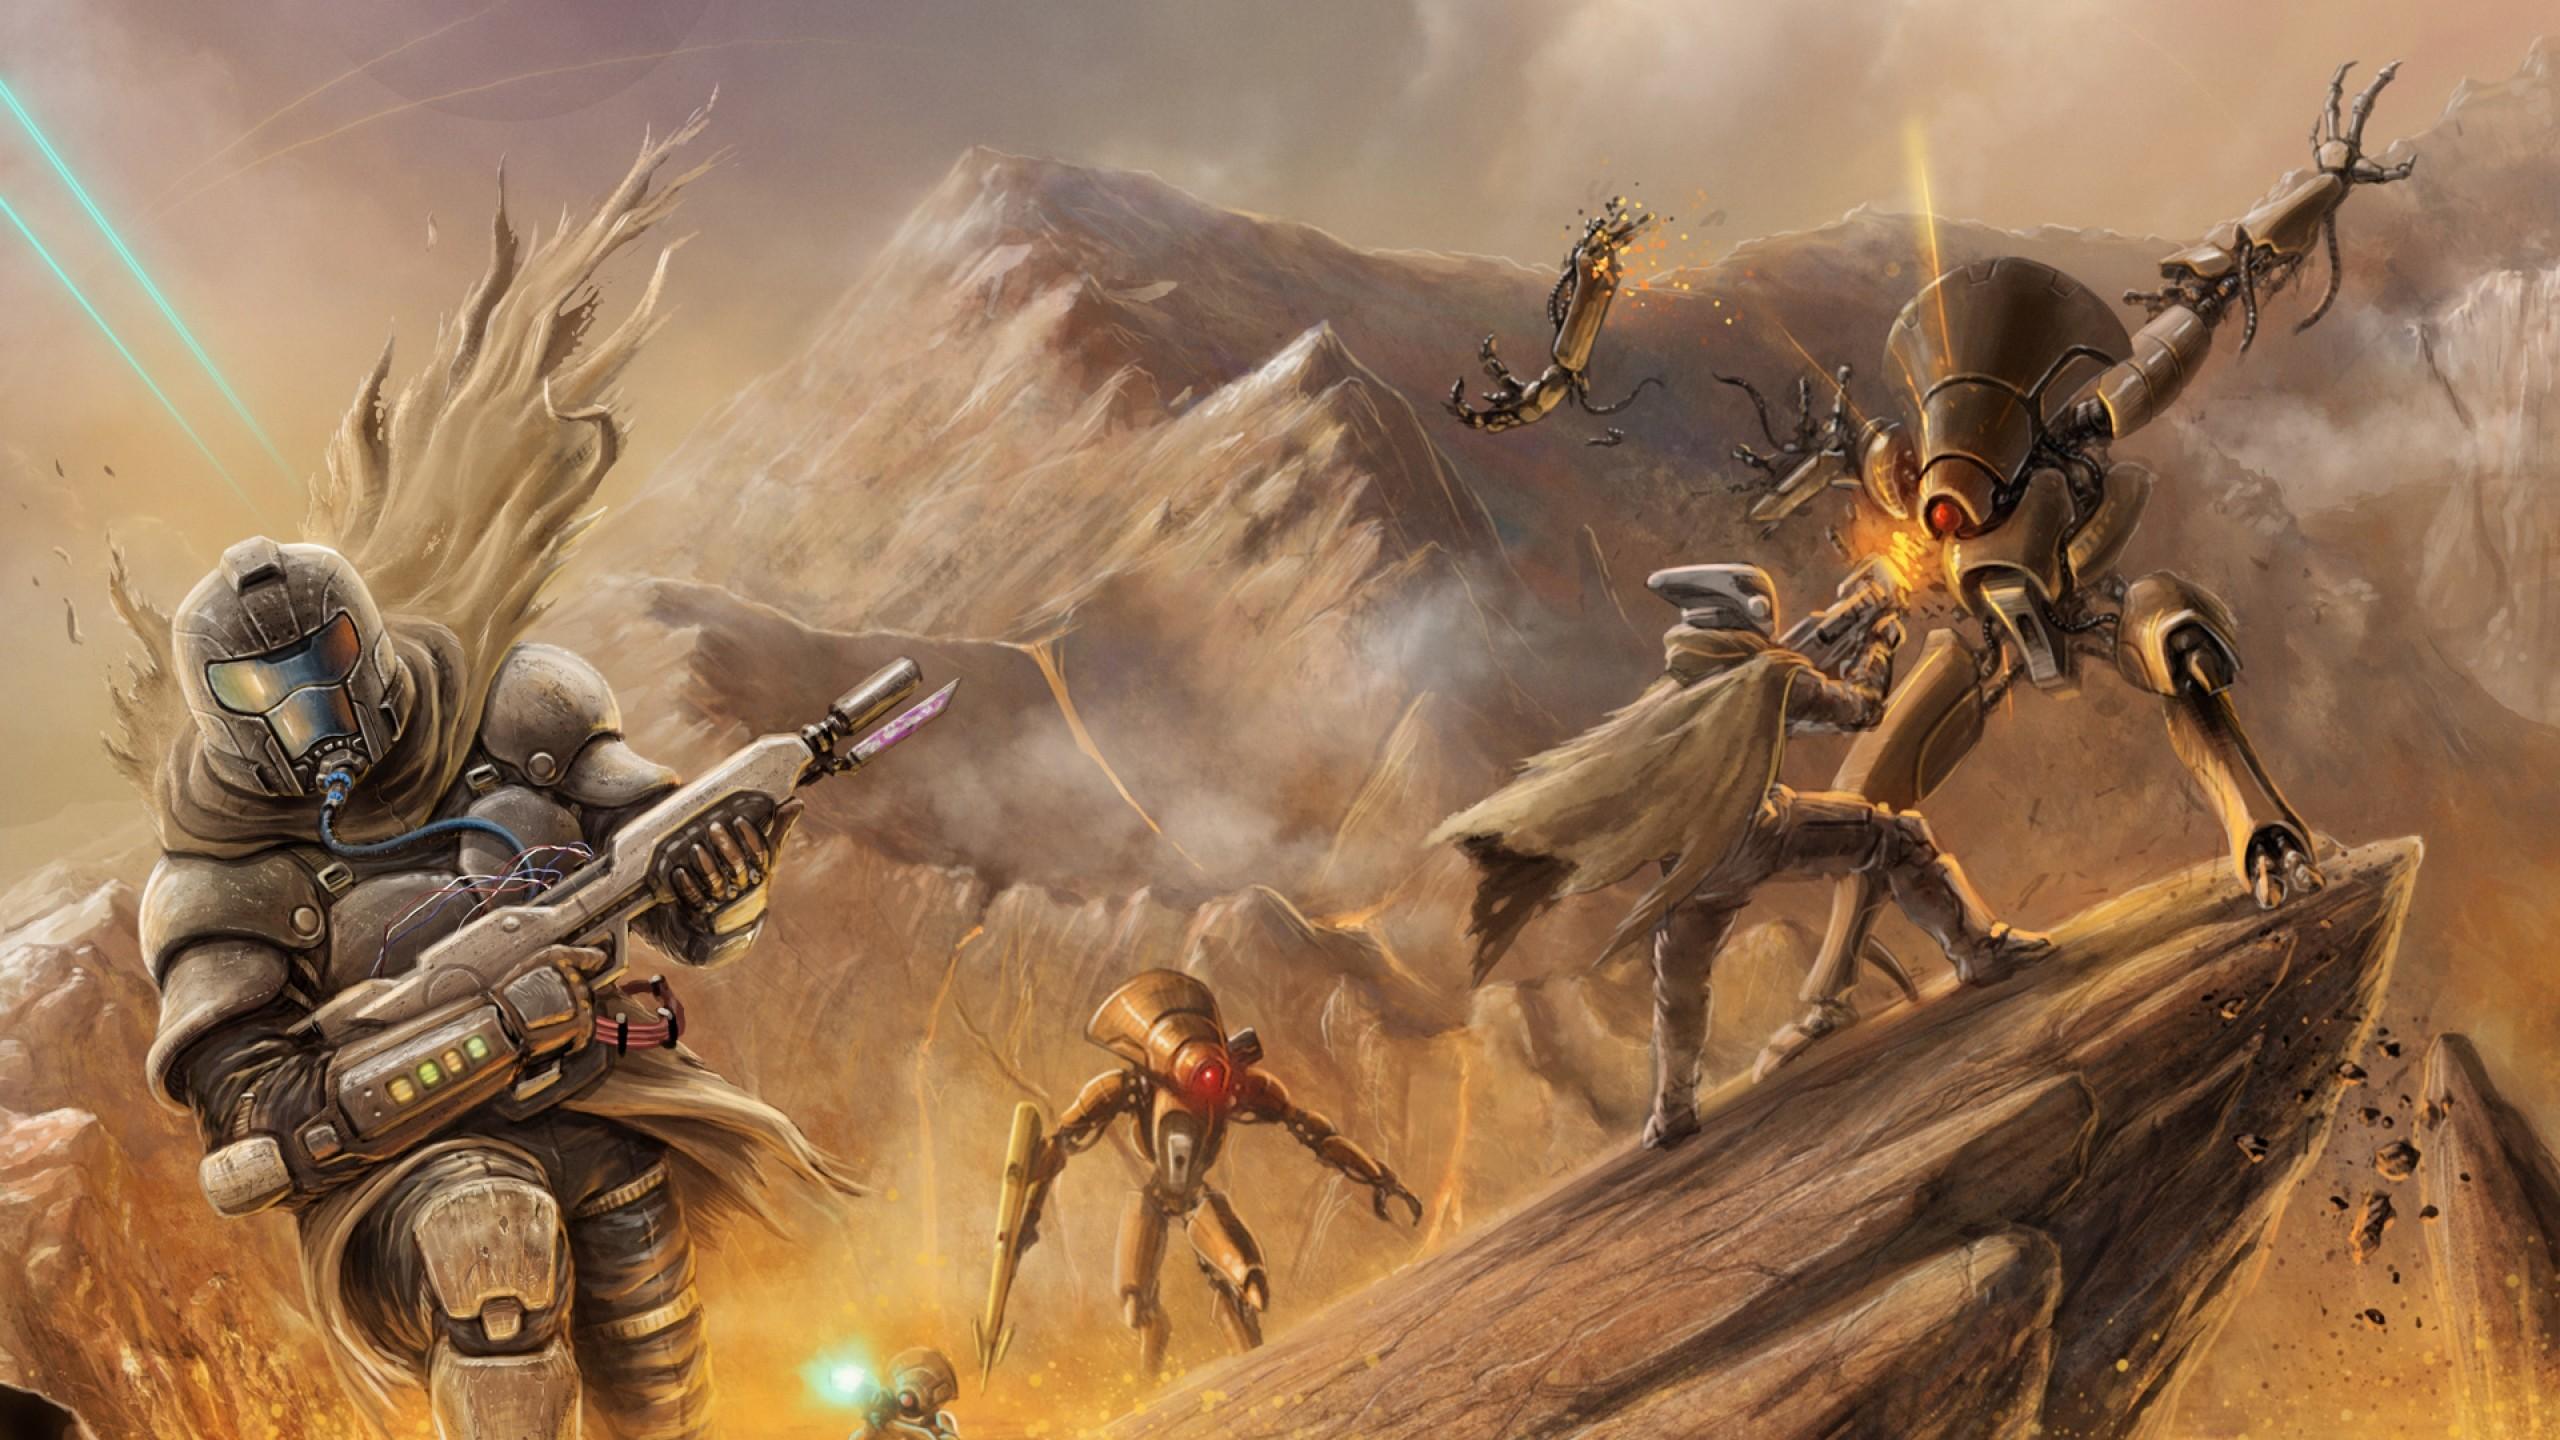 Download Wallpaper Destiny, Bungie, Battle .